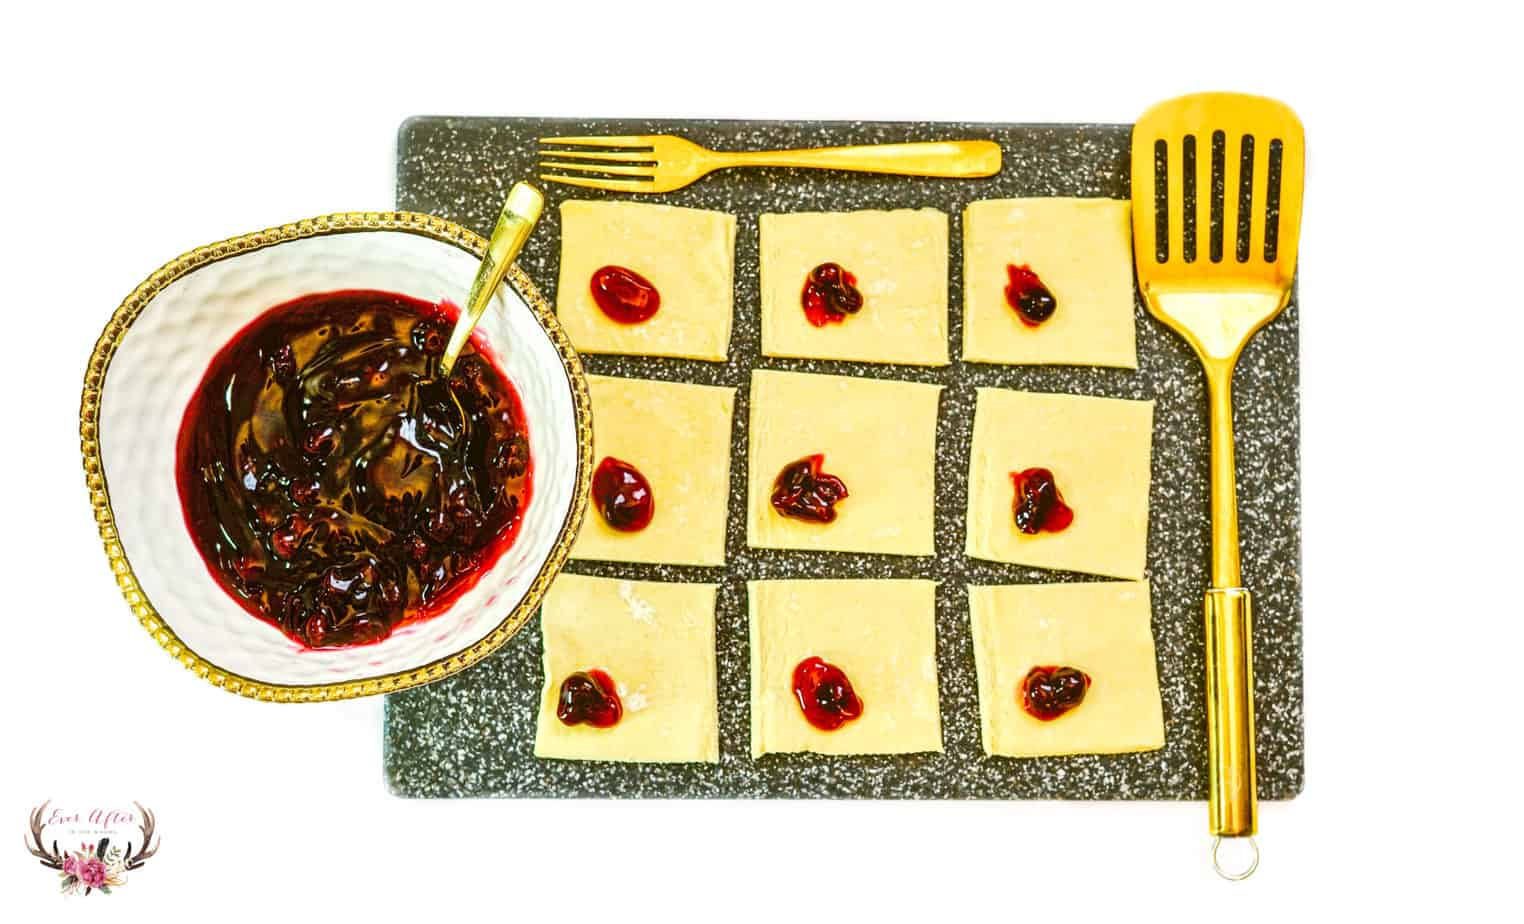 3 ingredient blueberry pastries